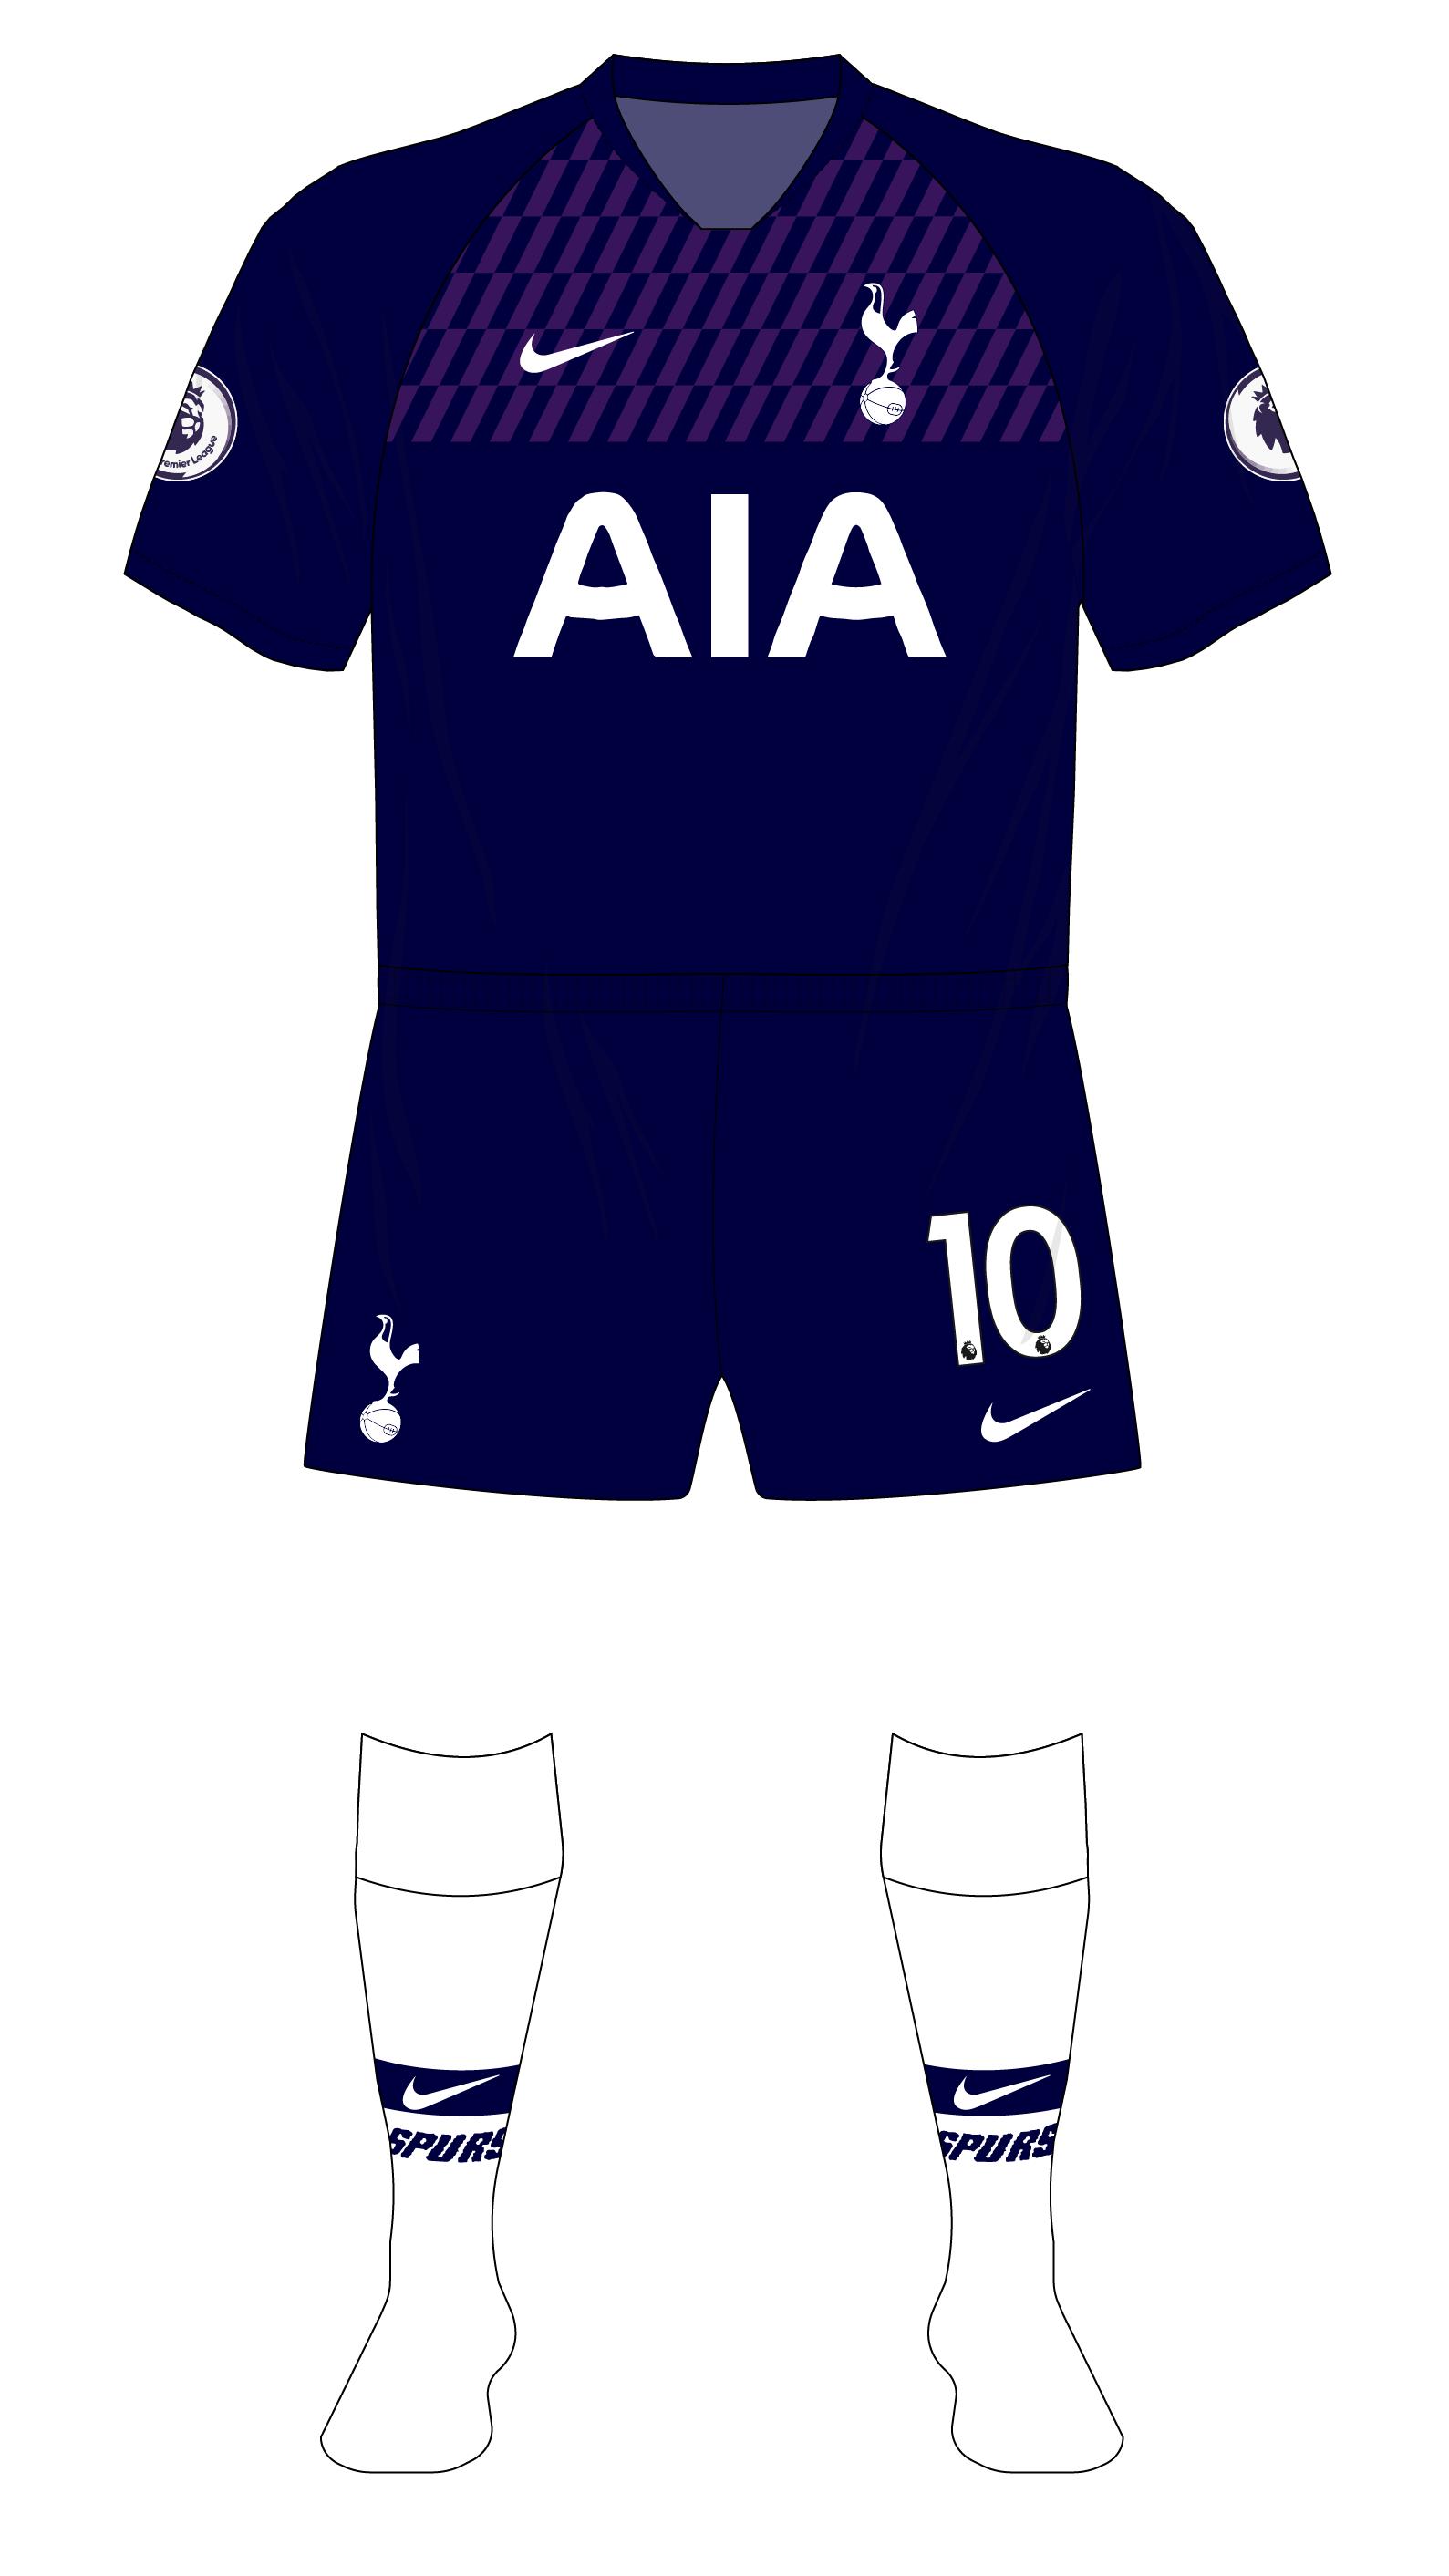 Tottenham Hotspur Spurs 2019 2020 Nike Away White Socks Museum Of Jerseys